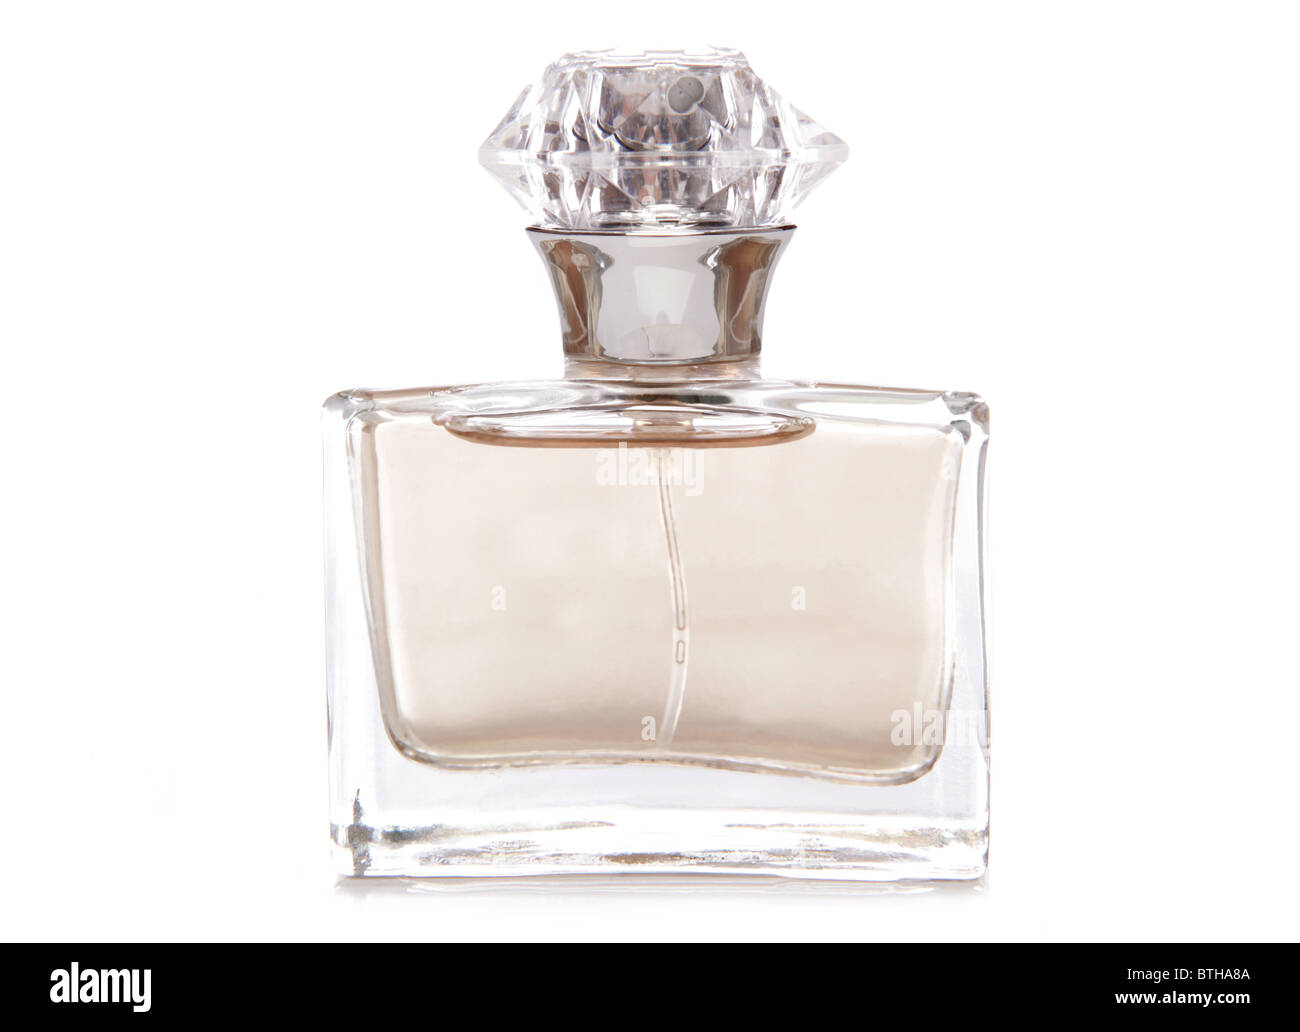 Womens perfume bottle studio cutout - Stock Image